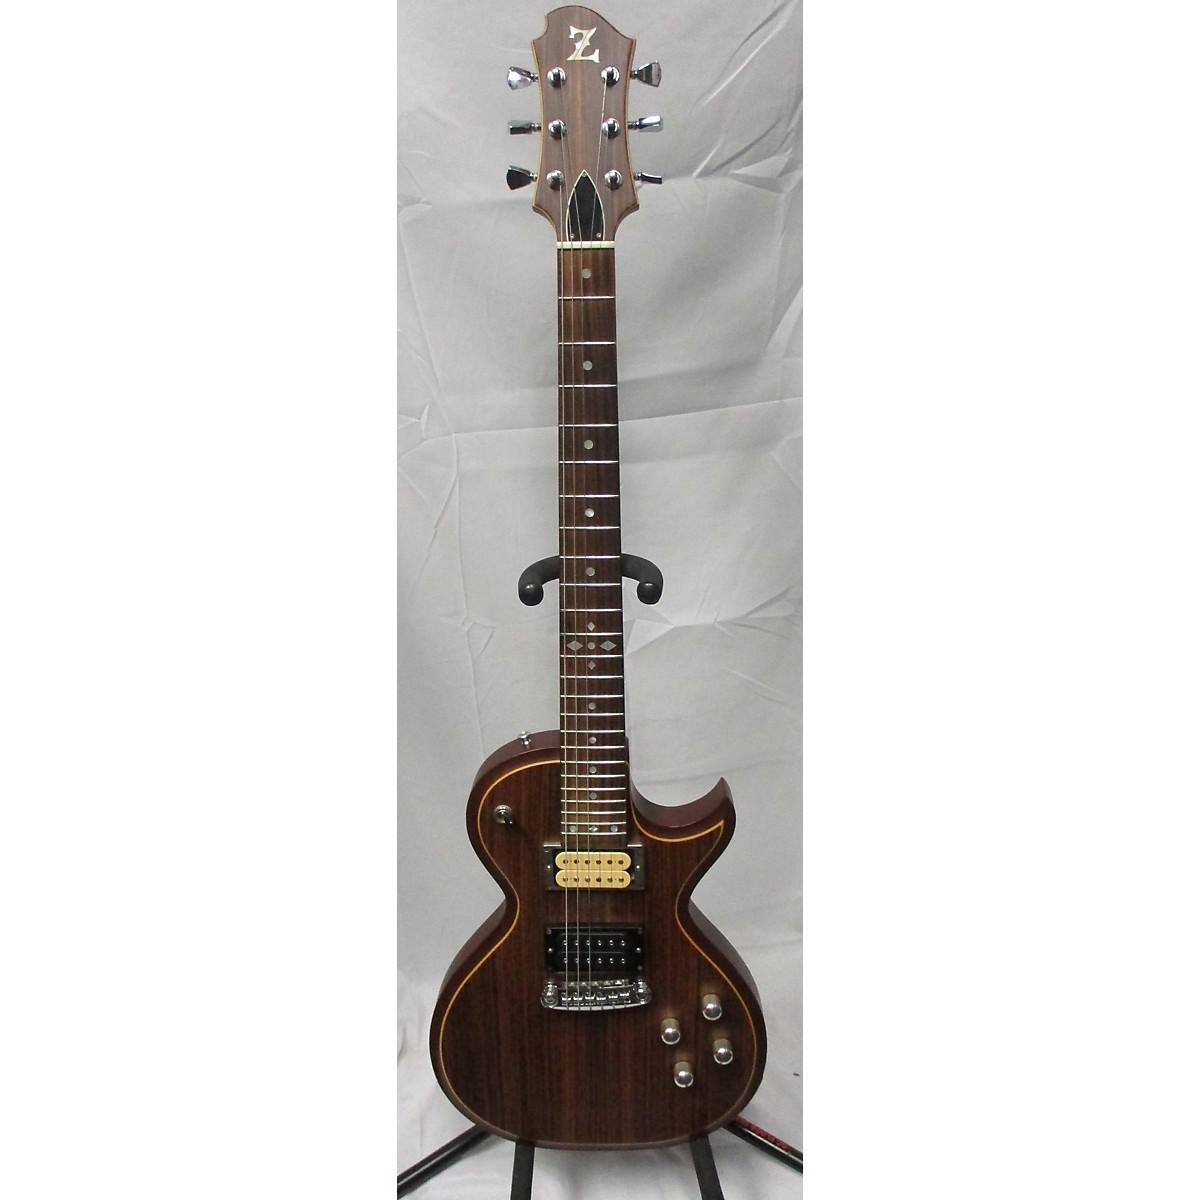 Zemaitis Z24 Solid Body Electric Guitar